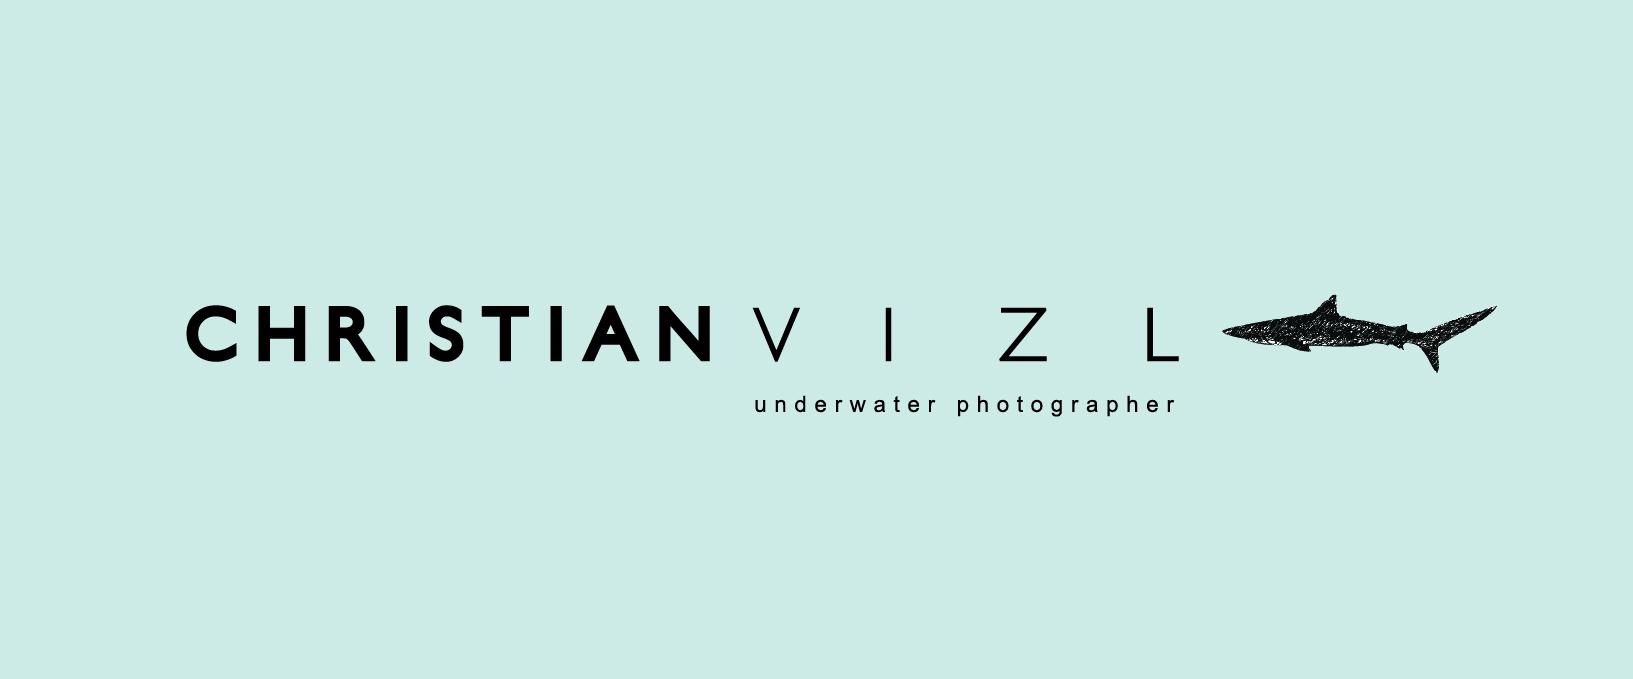 Christian Vizl Signature